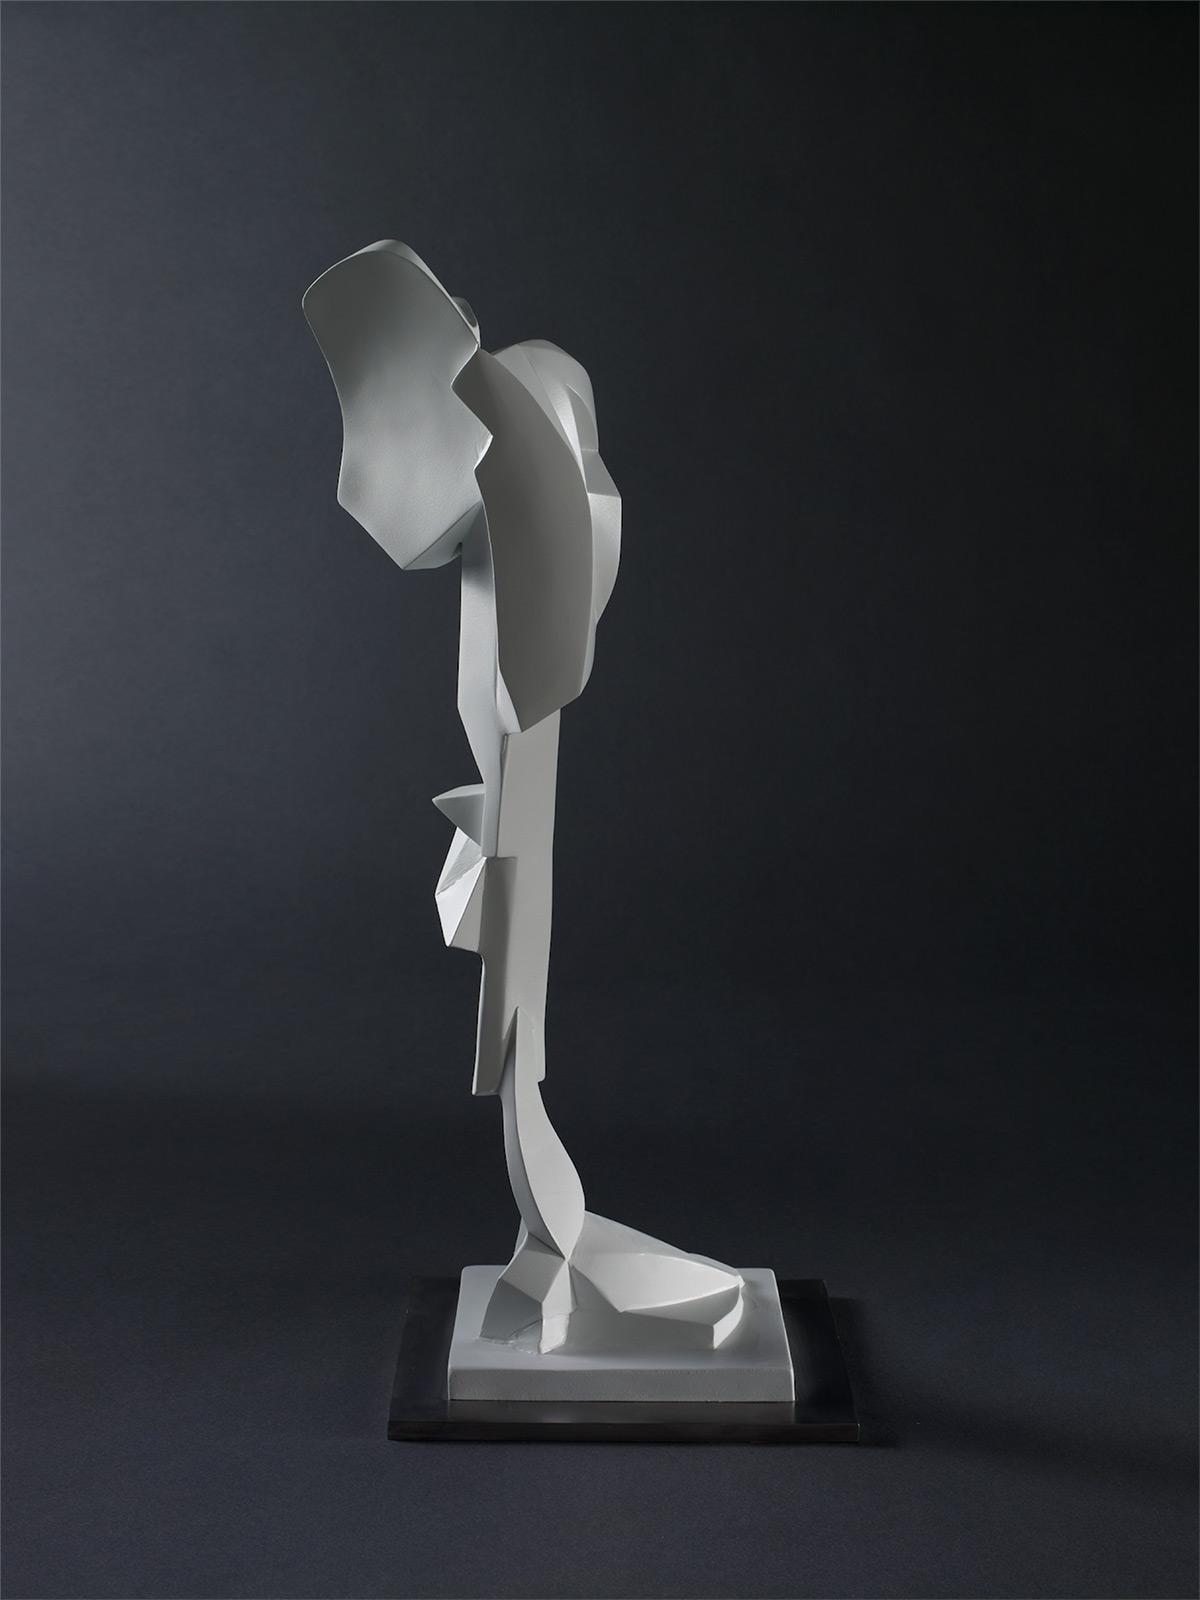 "Homage to Stephen DeStaebler – 2006 – 21 x 7 x 9 – Cast Bronze and Stainless Steel - <a href=""mailto:judbergeron@mac.com?subject=Inquire: Homage to Stephen DeStaebler"">Inquire</a>"